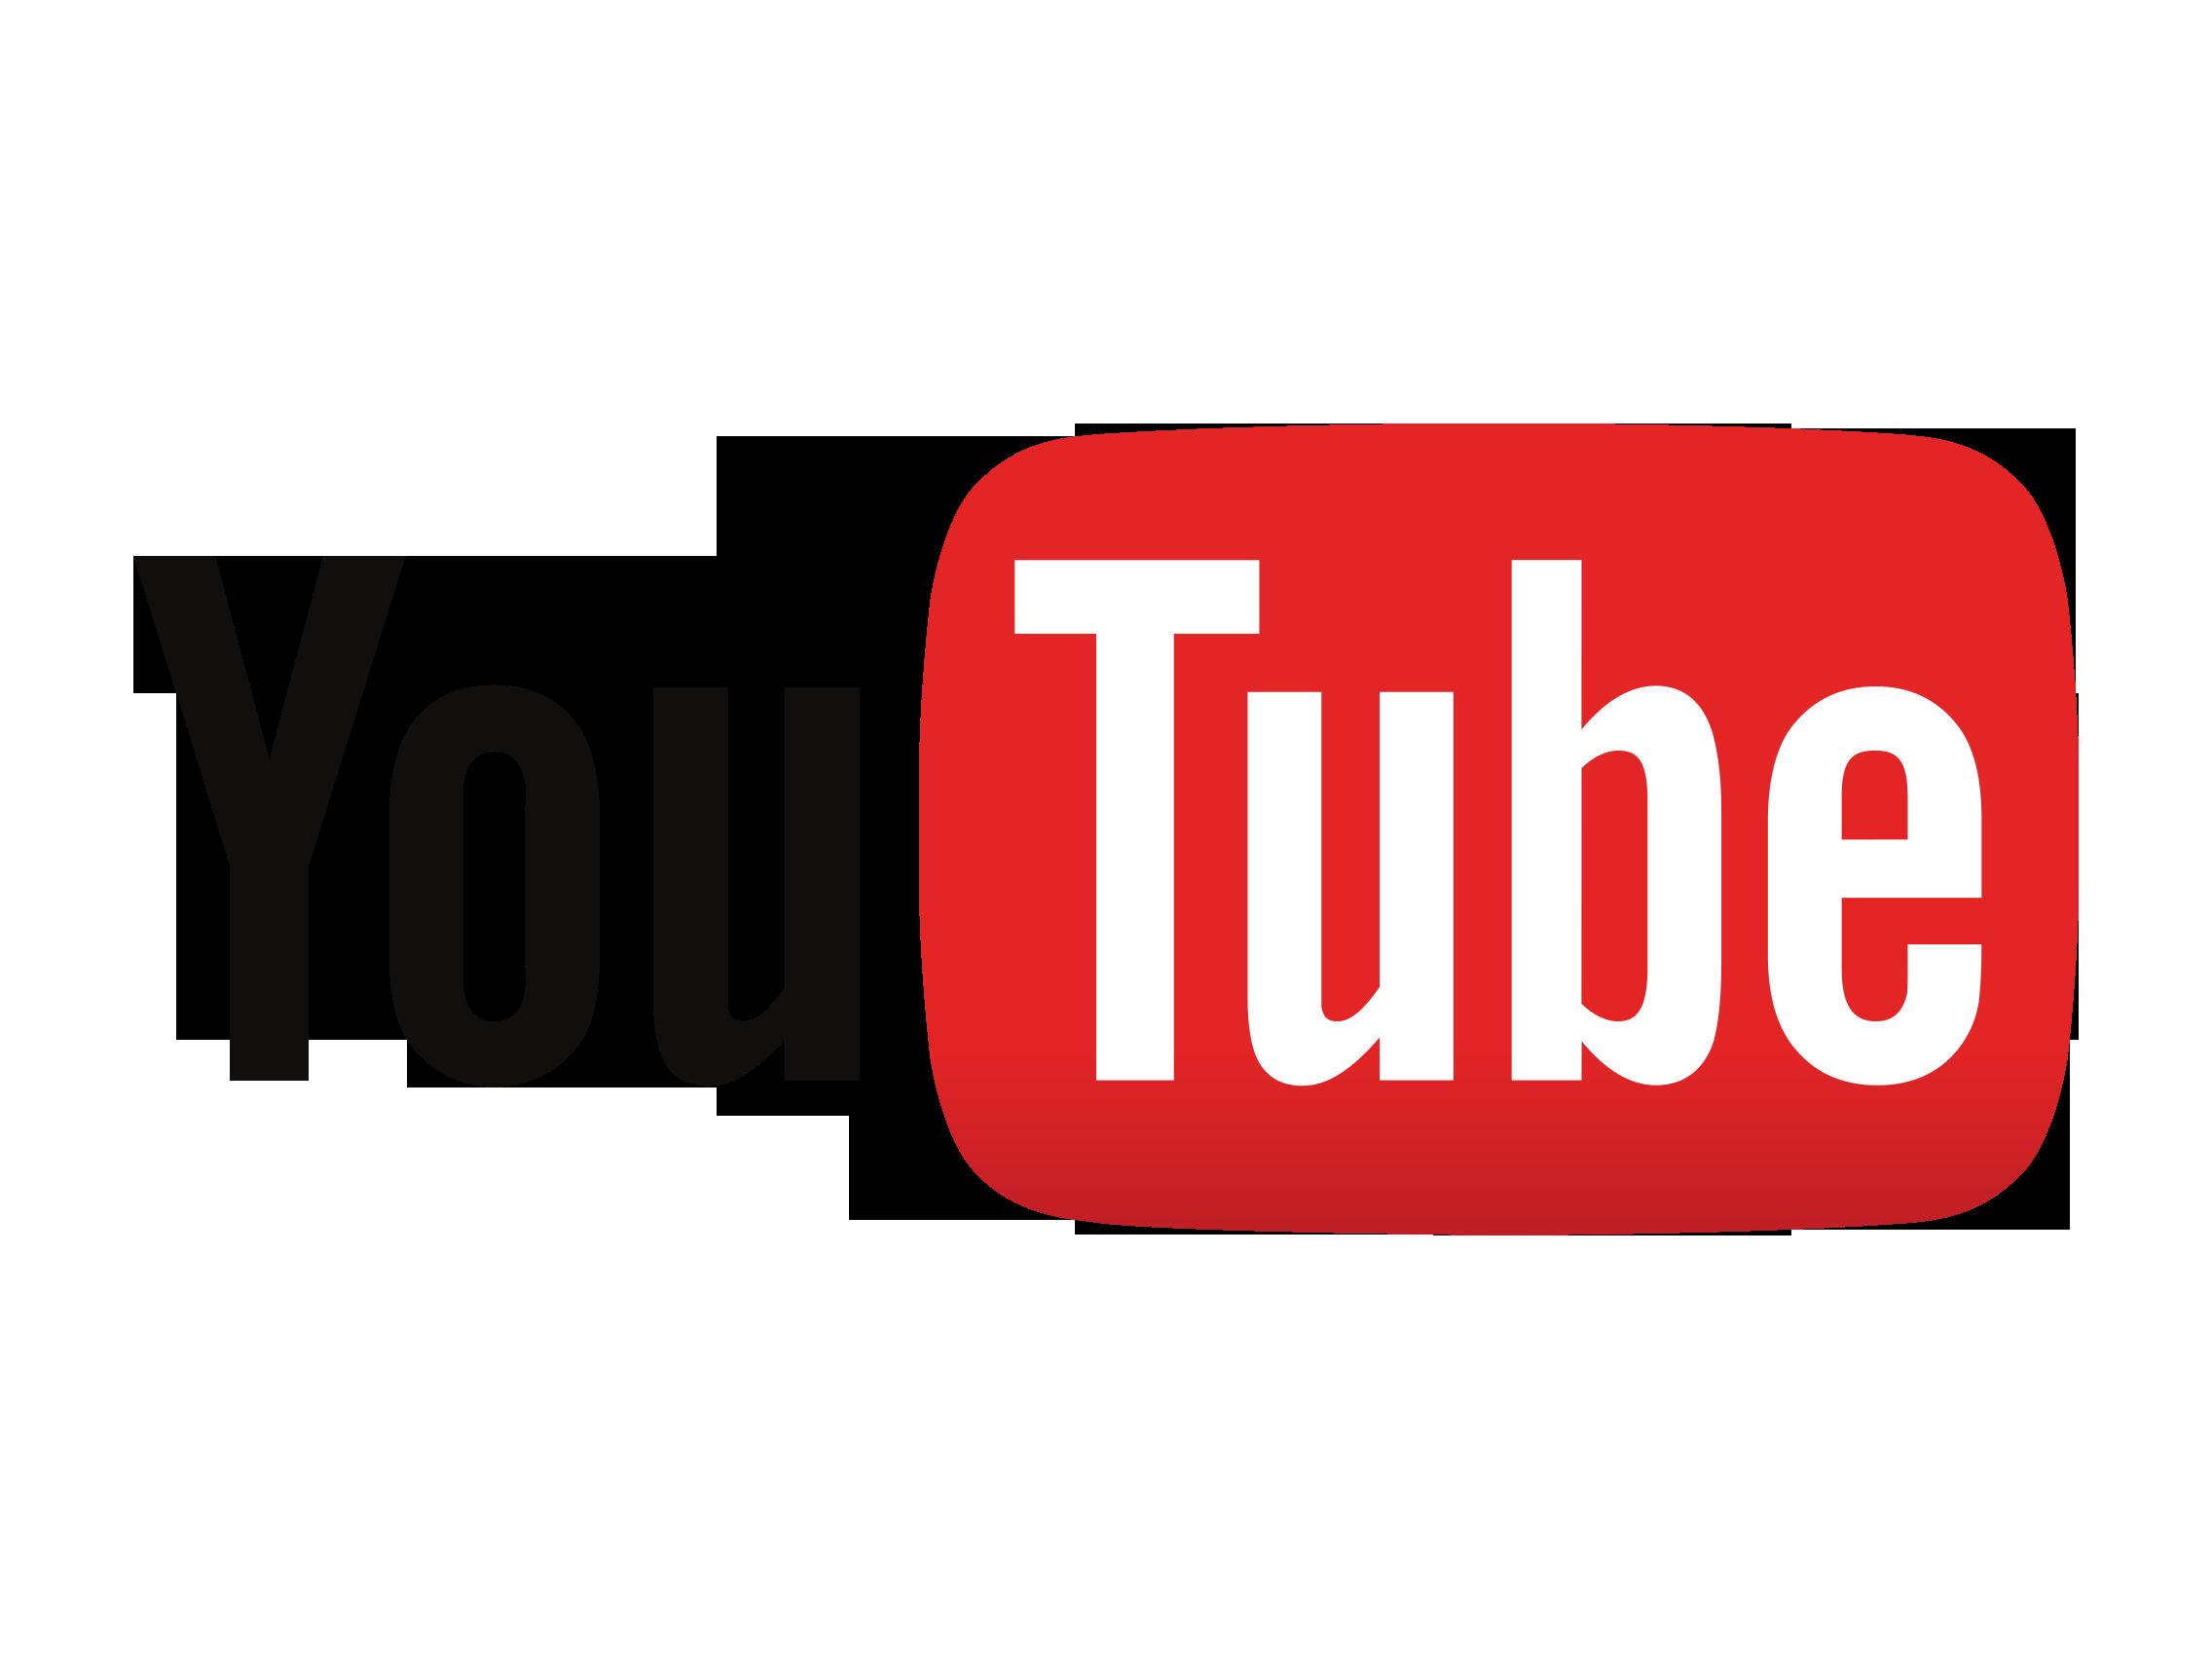 JPS Bandy - YouTube channel